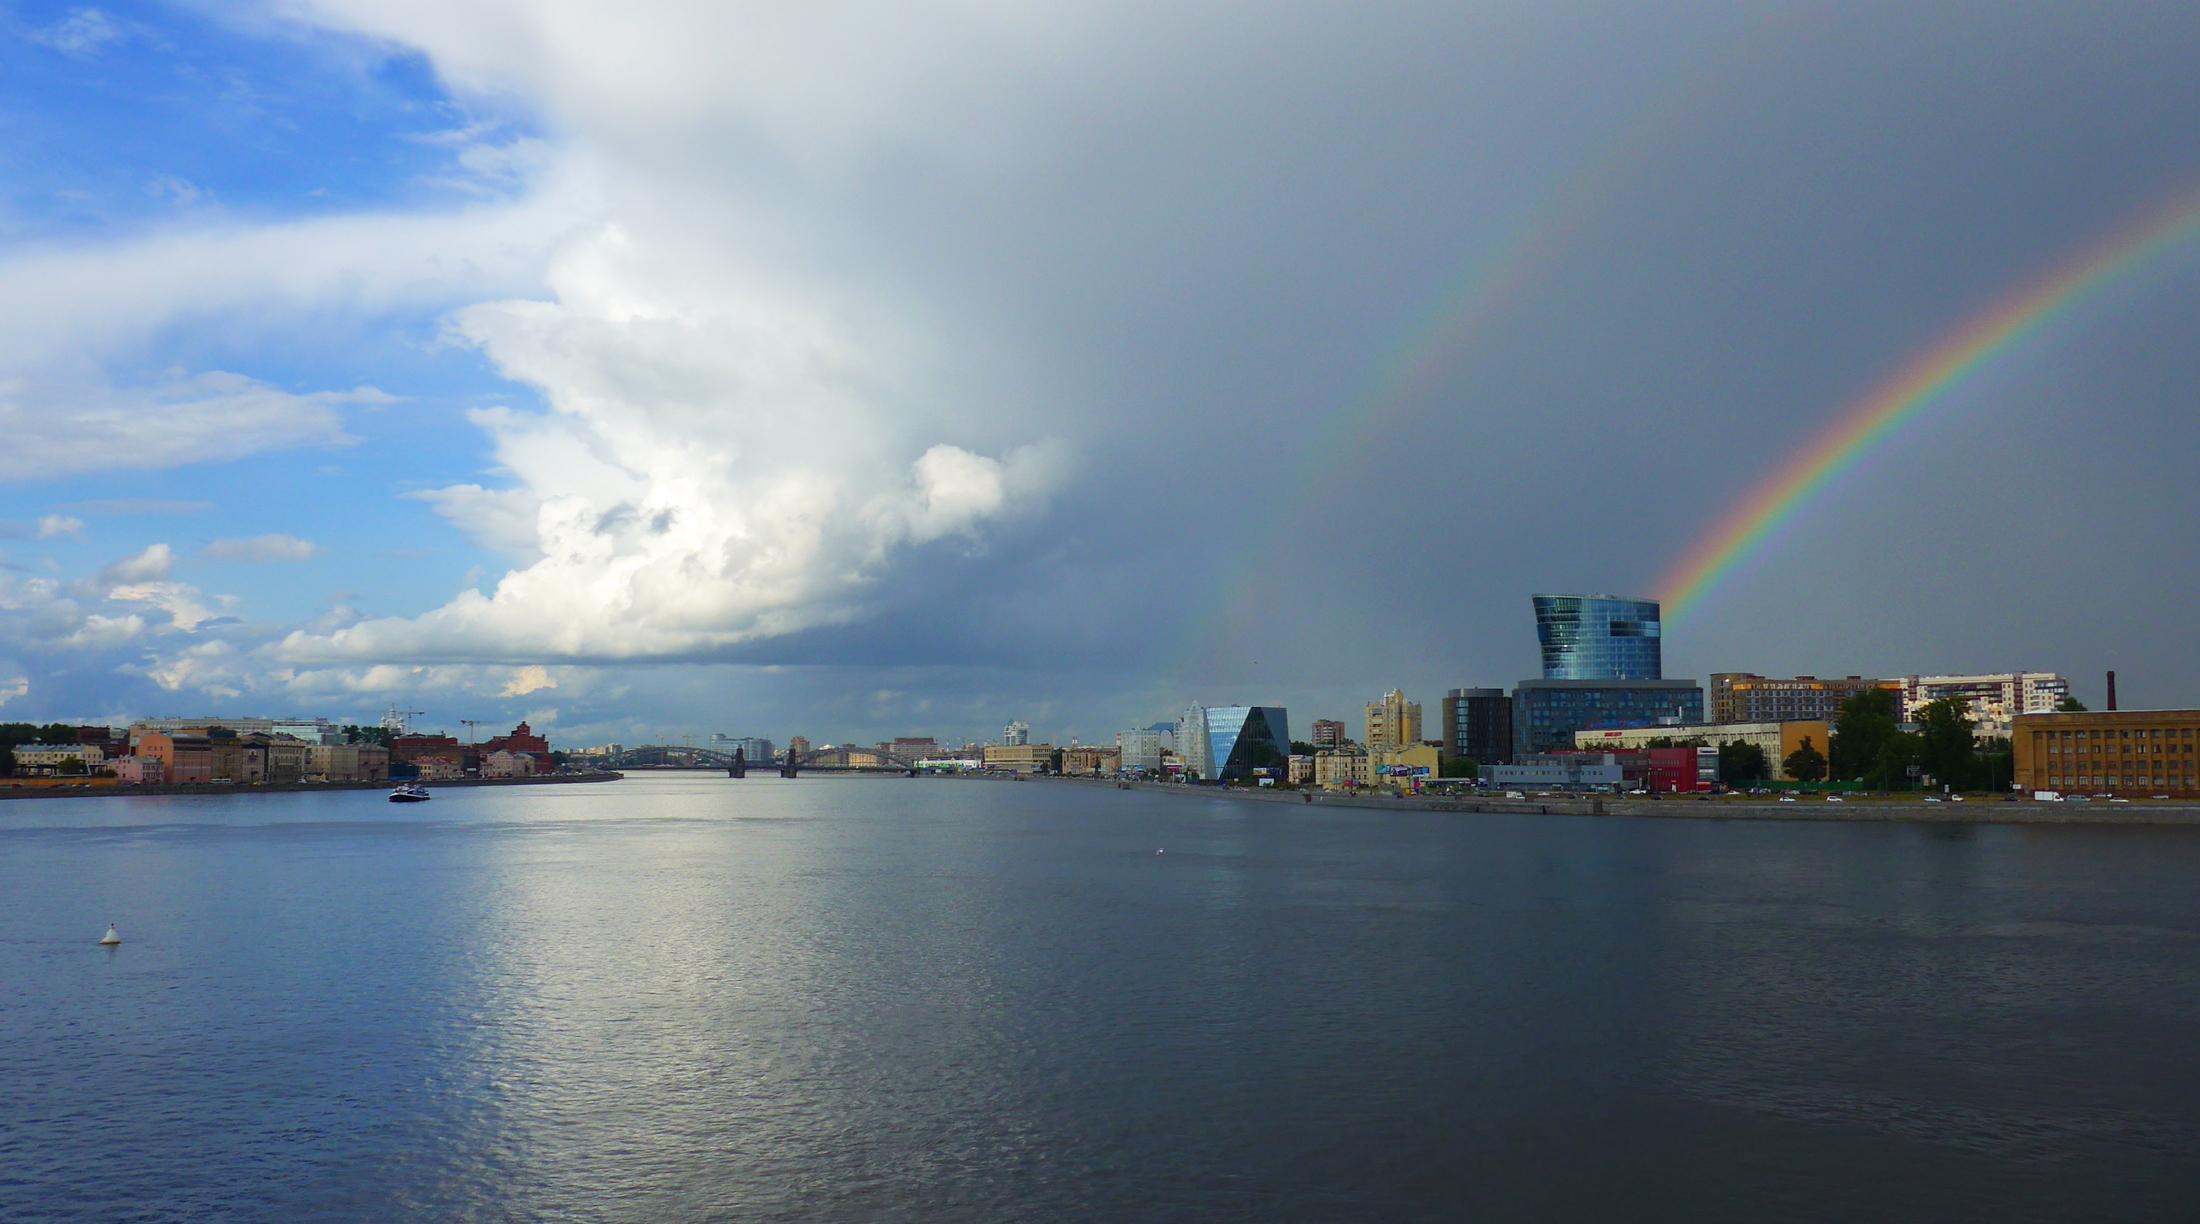 Санкт-Петербург. 2014.08.22